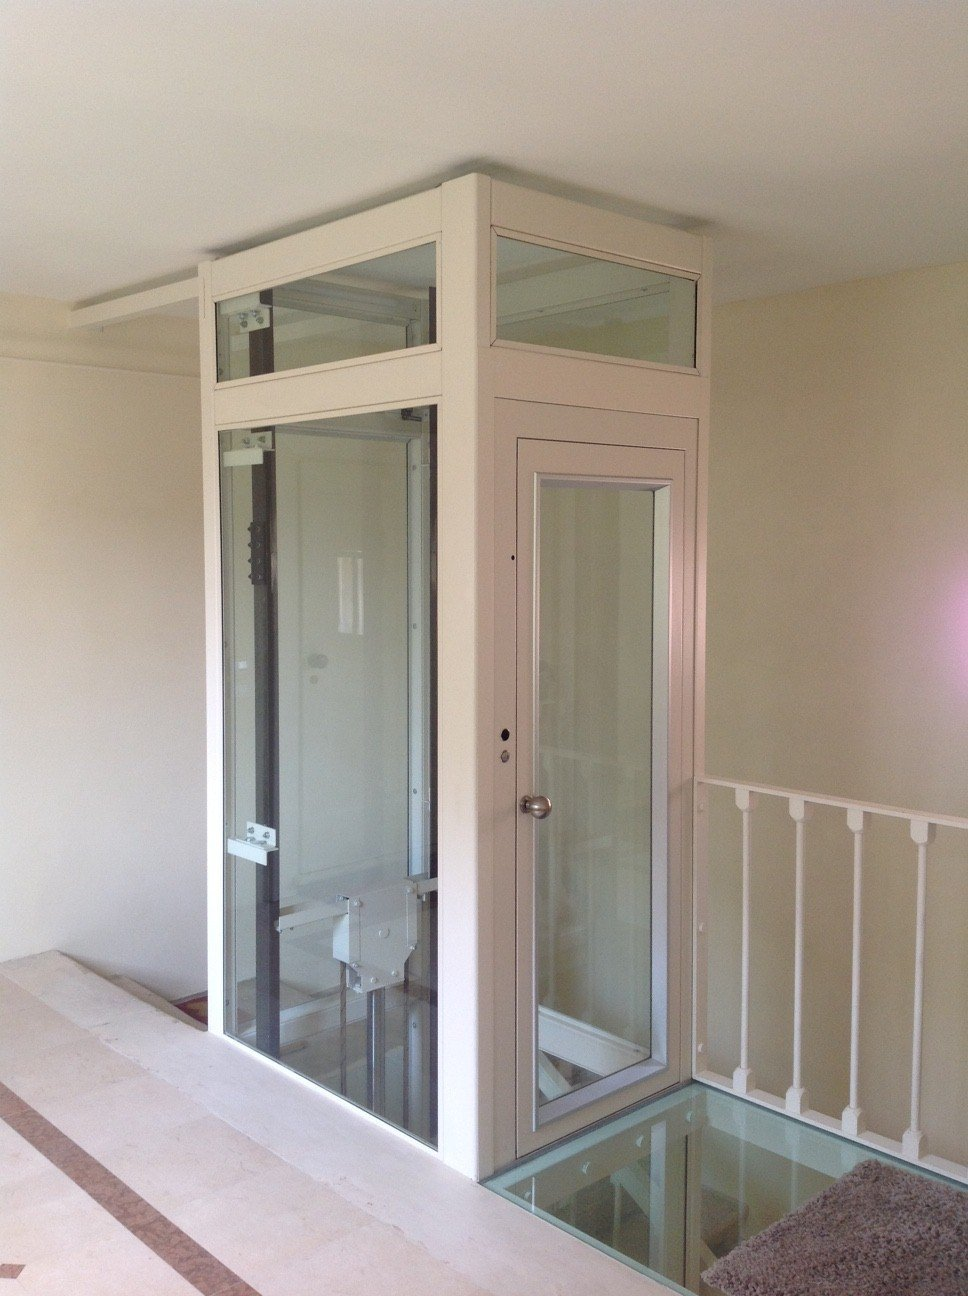 ascensore trasparente esterno-vista frontale